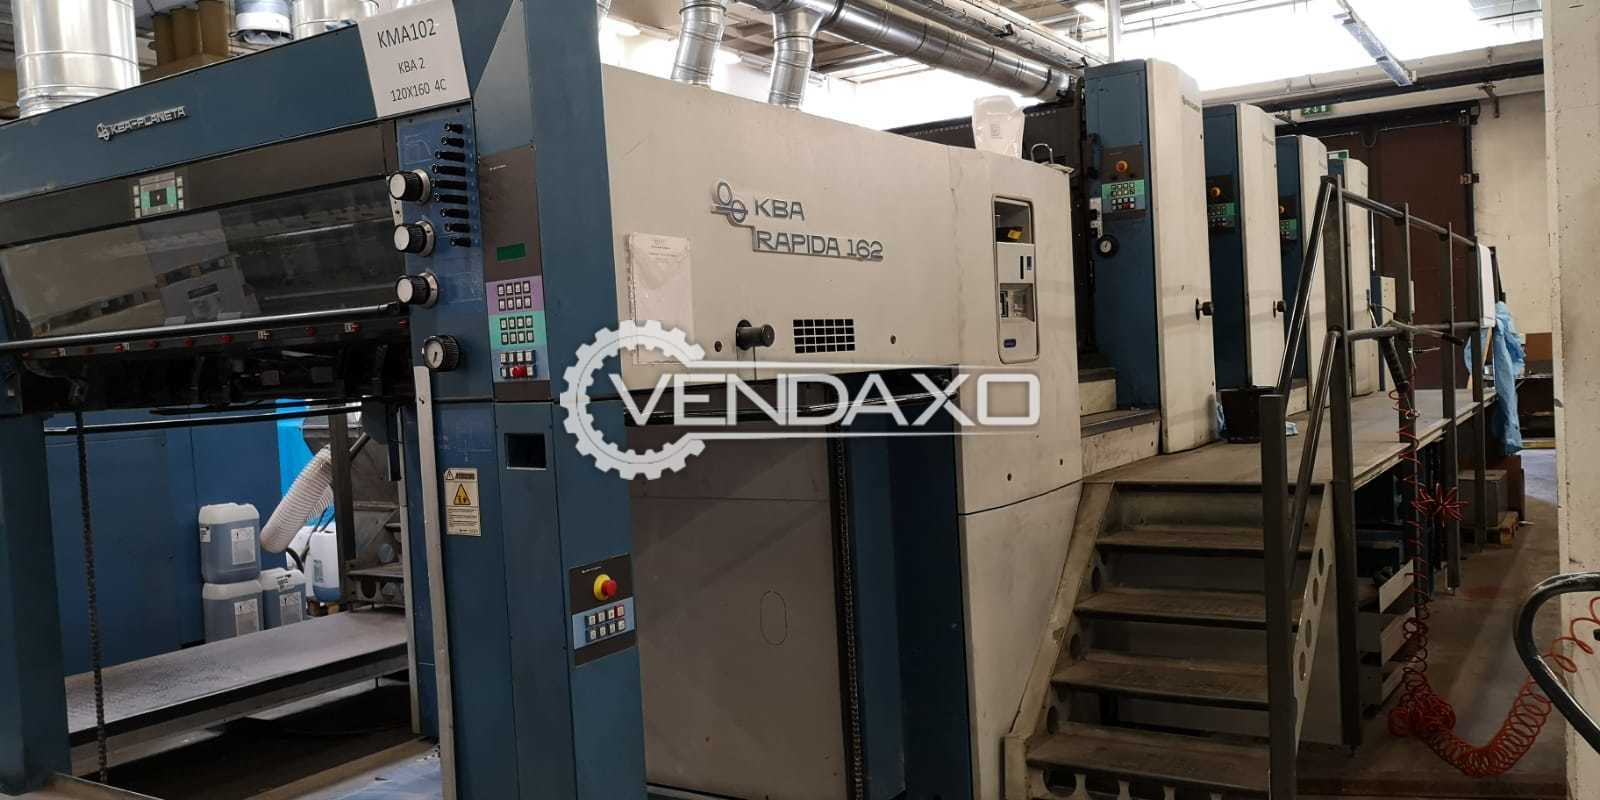 KBA Rapida 162 A4 SW2 Offset Printing Machine - 120 x 162 CM, 4 Color